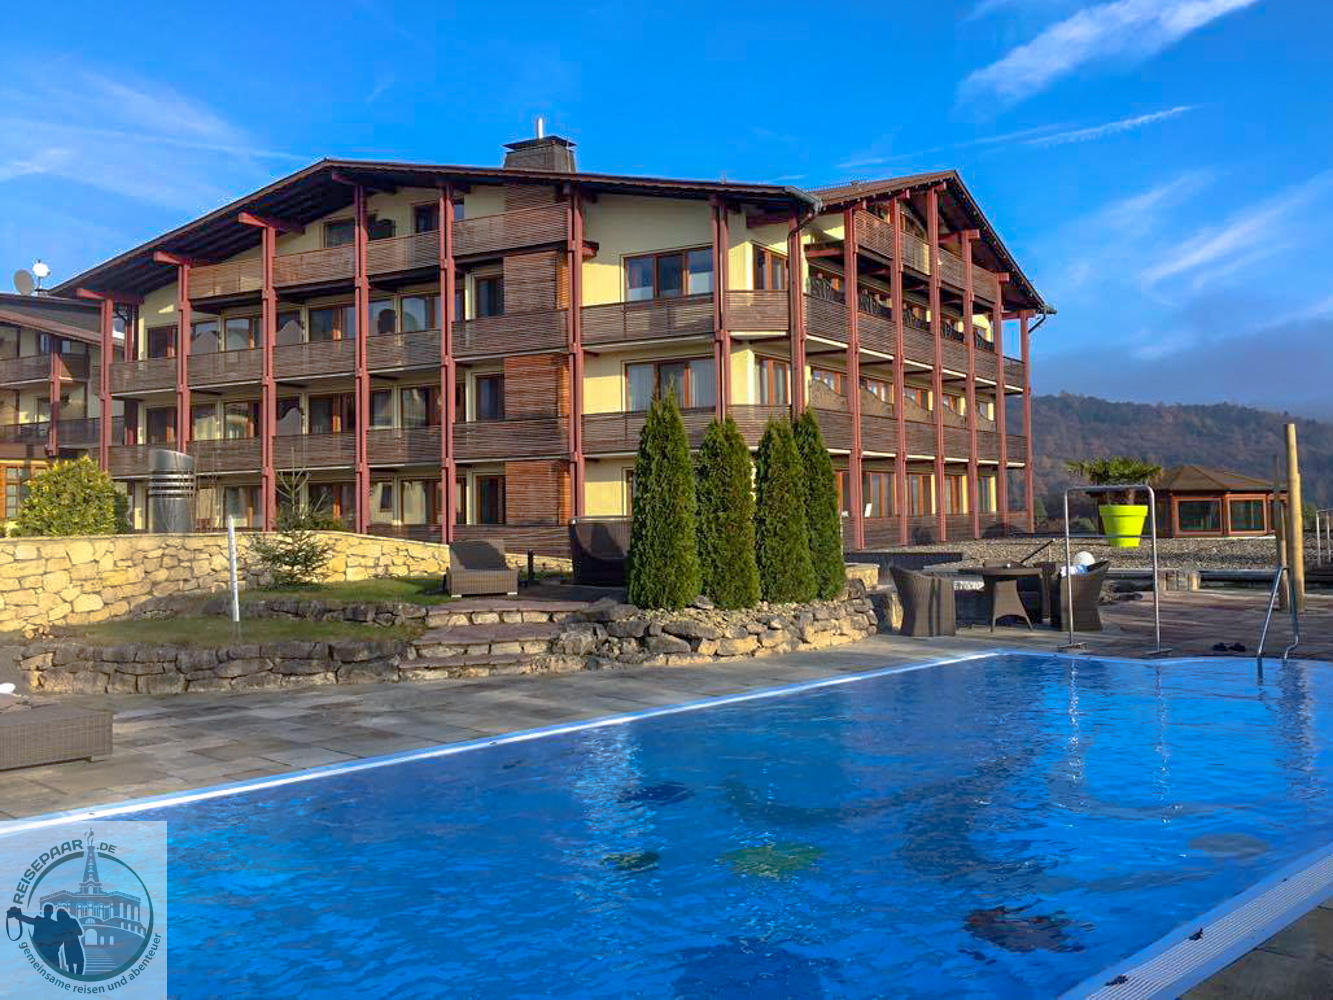 hotel-freund-oberorke-29